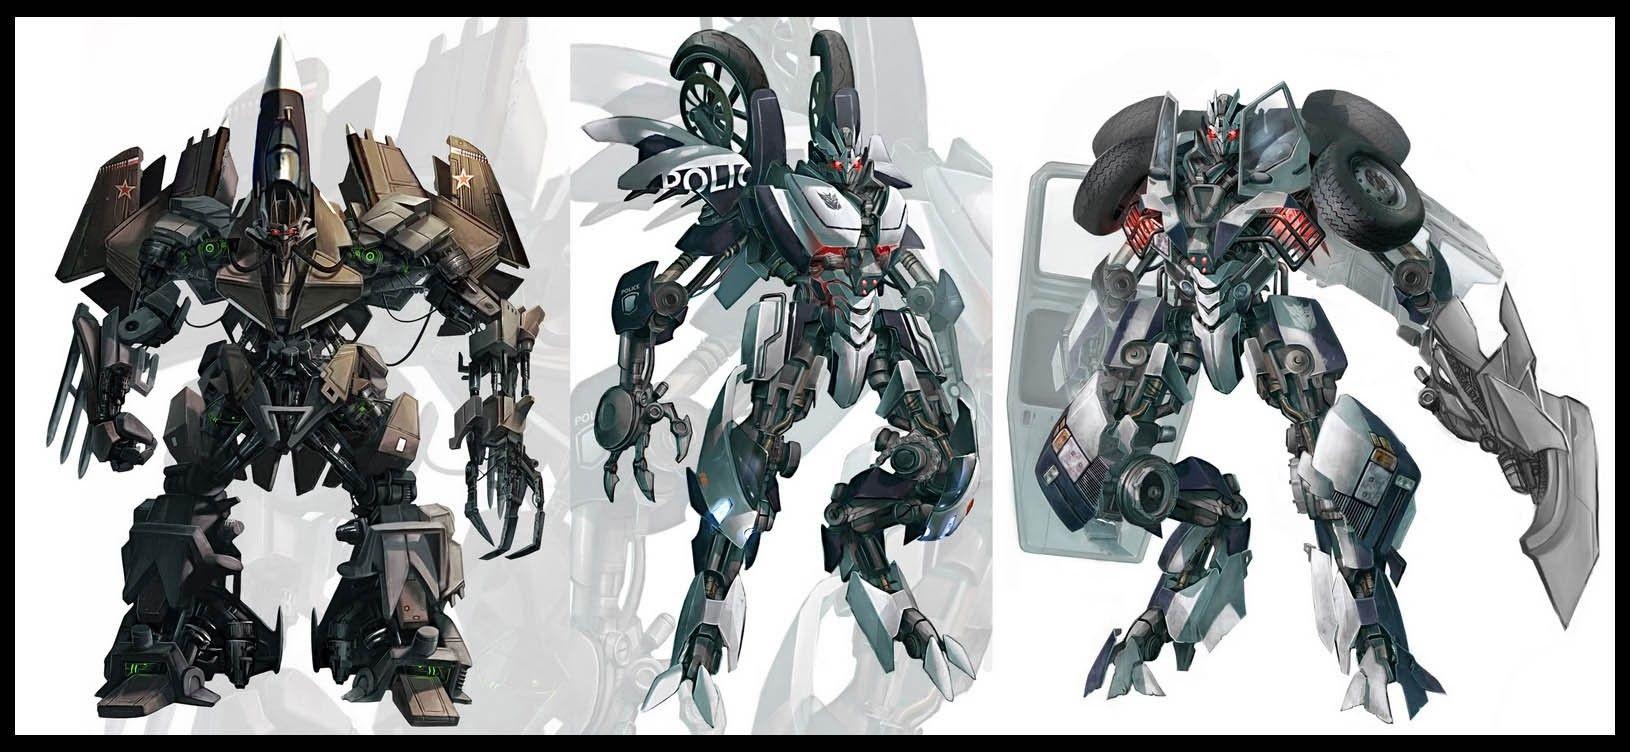 Original Decepticon Concept Designs Concept Art